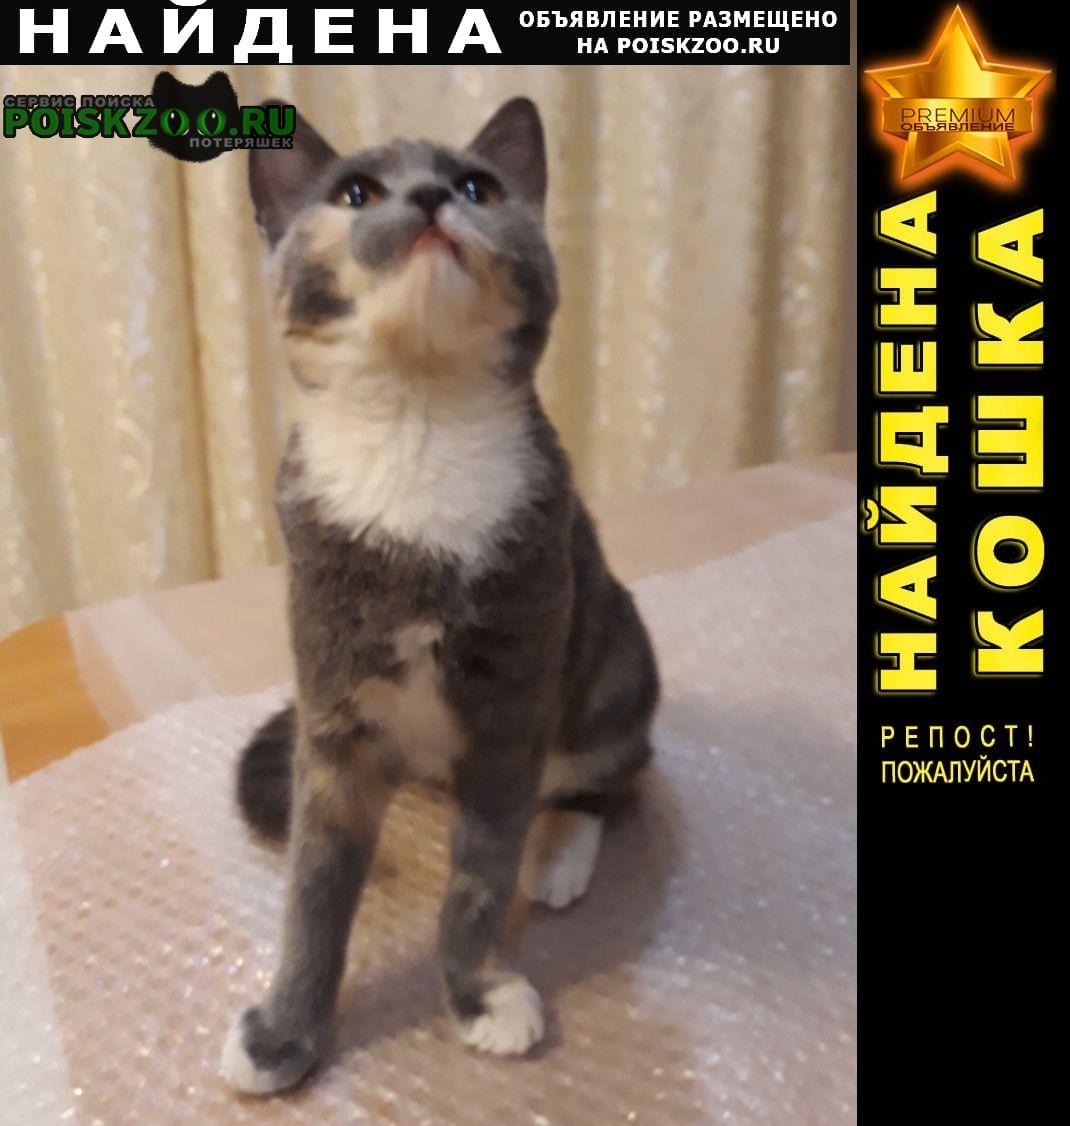 Найдена кошка котенок 5 месяцев Звенигород